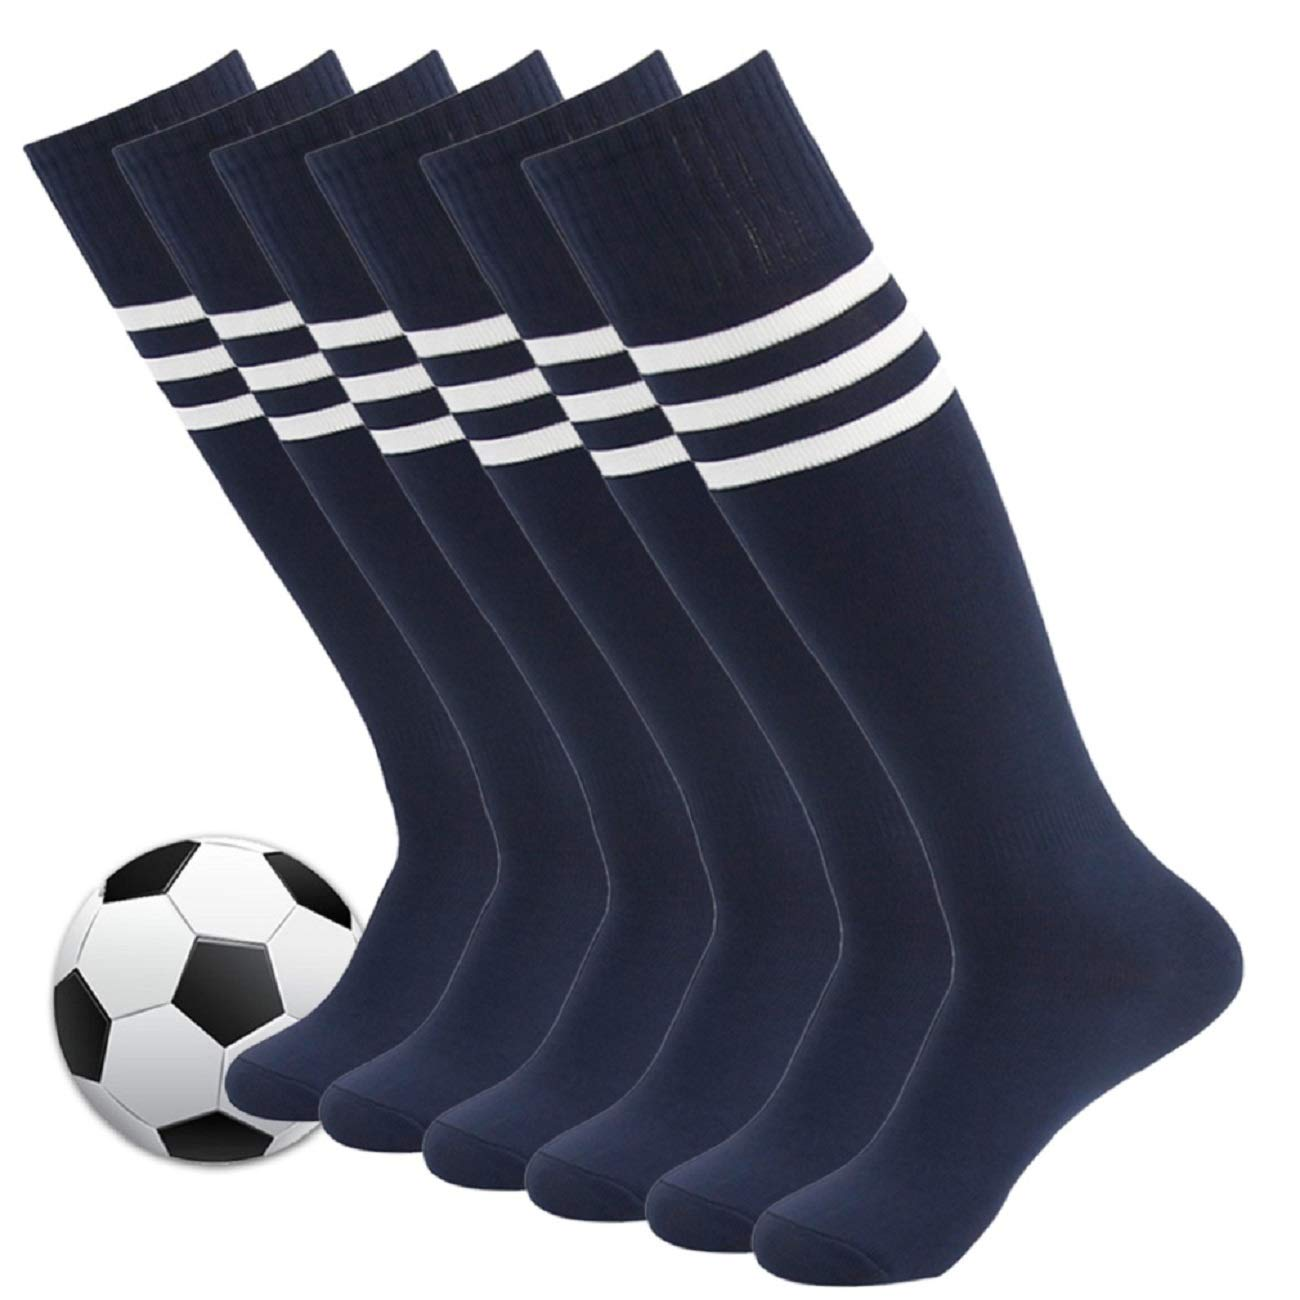 Baseball Socks,Fasoar Mens Womens Athletic Long Tube Knee High Team Socks 6 Pairs Navy Blue Stripe by Fasoar